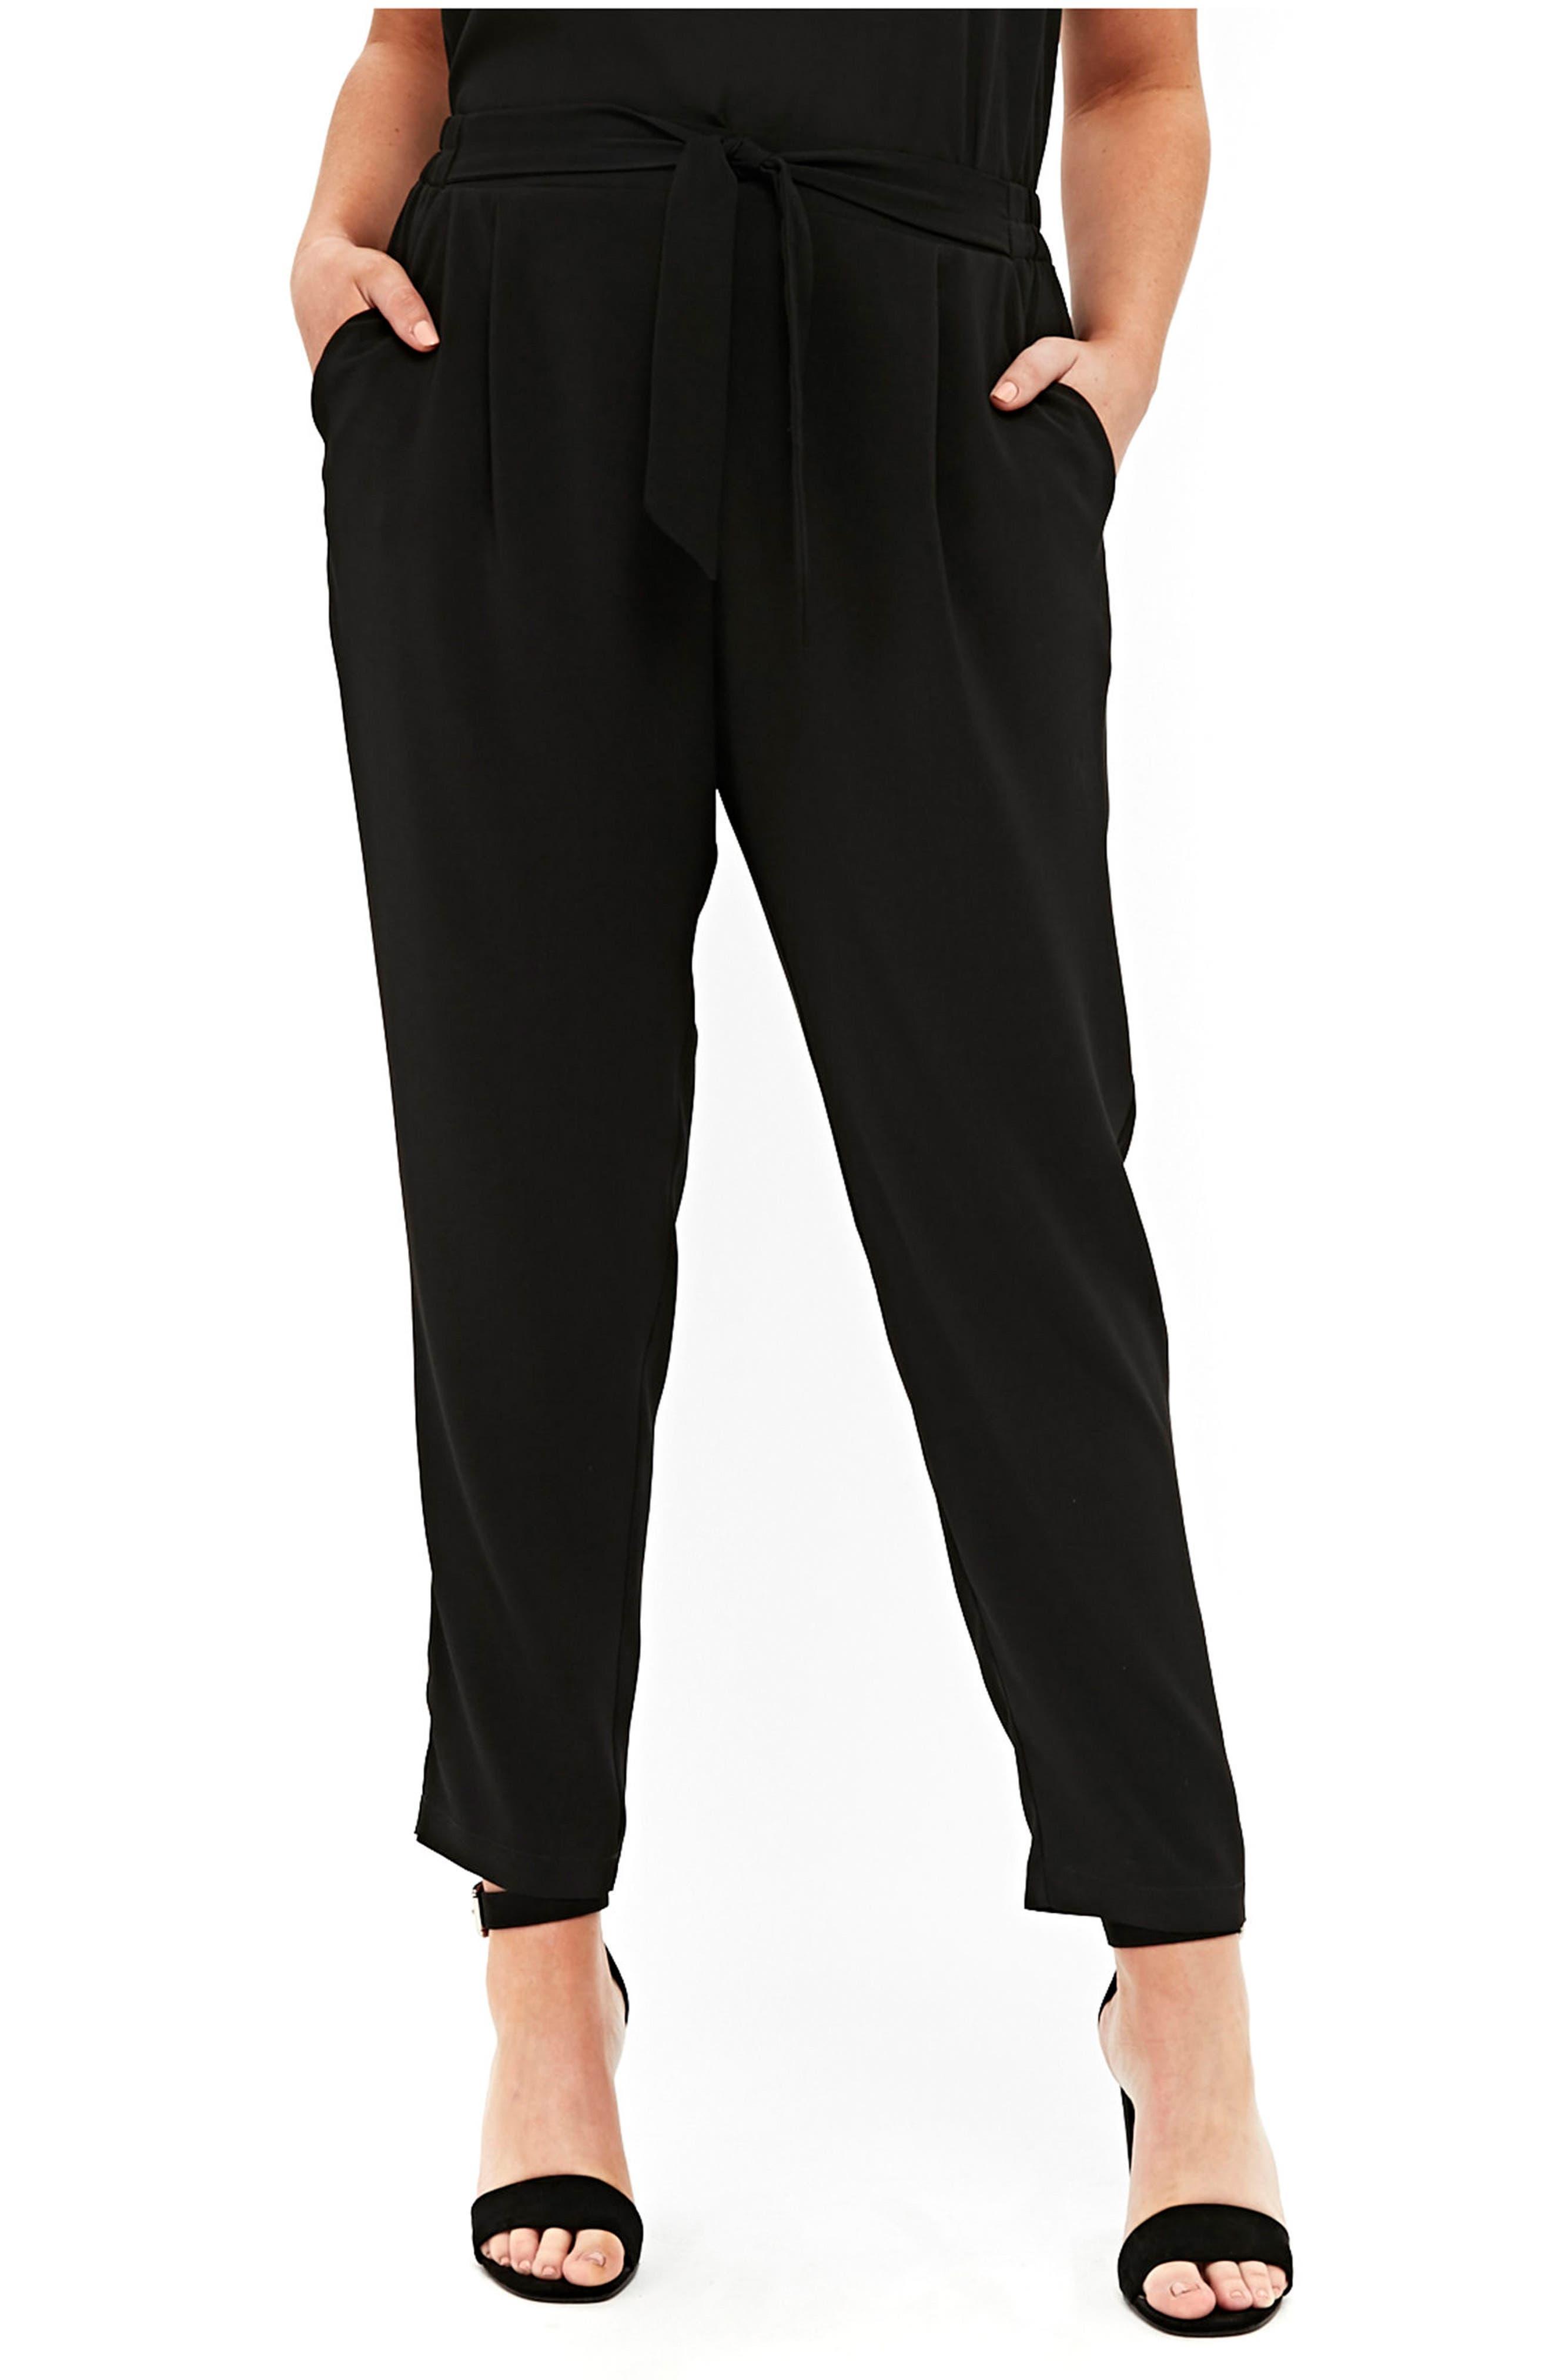 Ripple Tapered Pants,                             Main thumbnail 1, color,                             Black